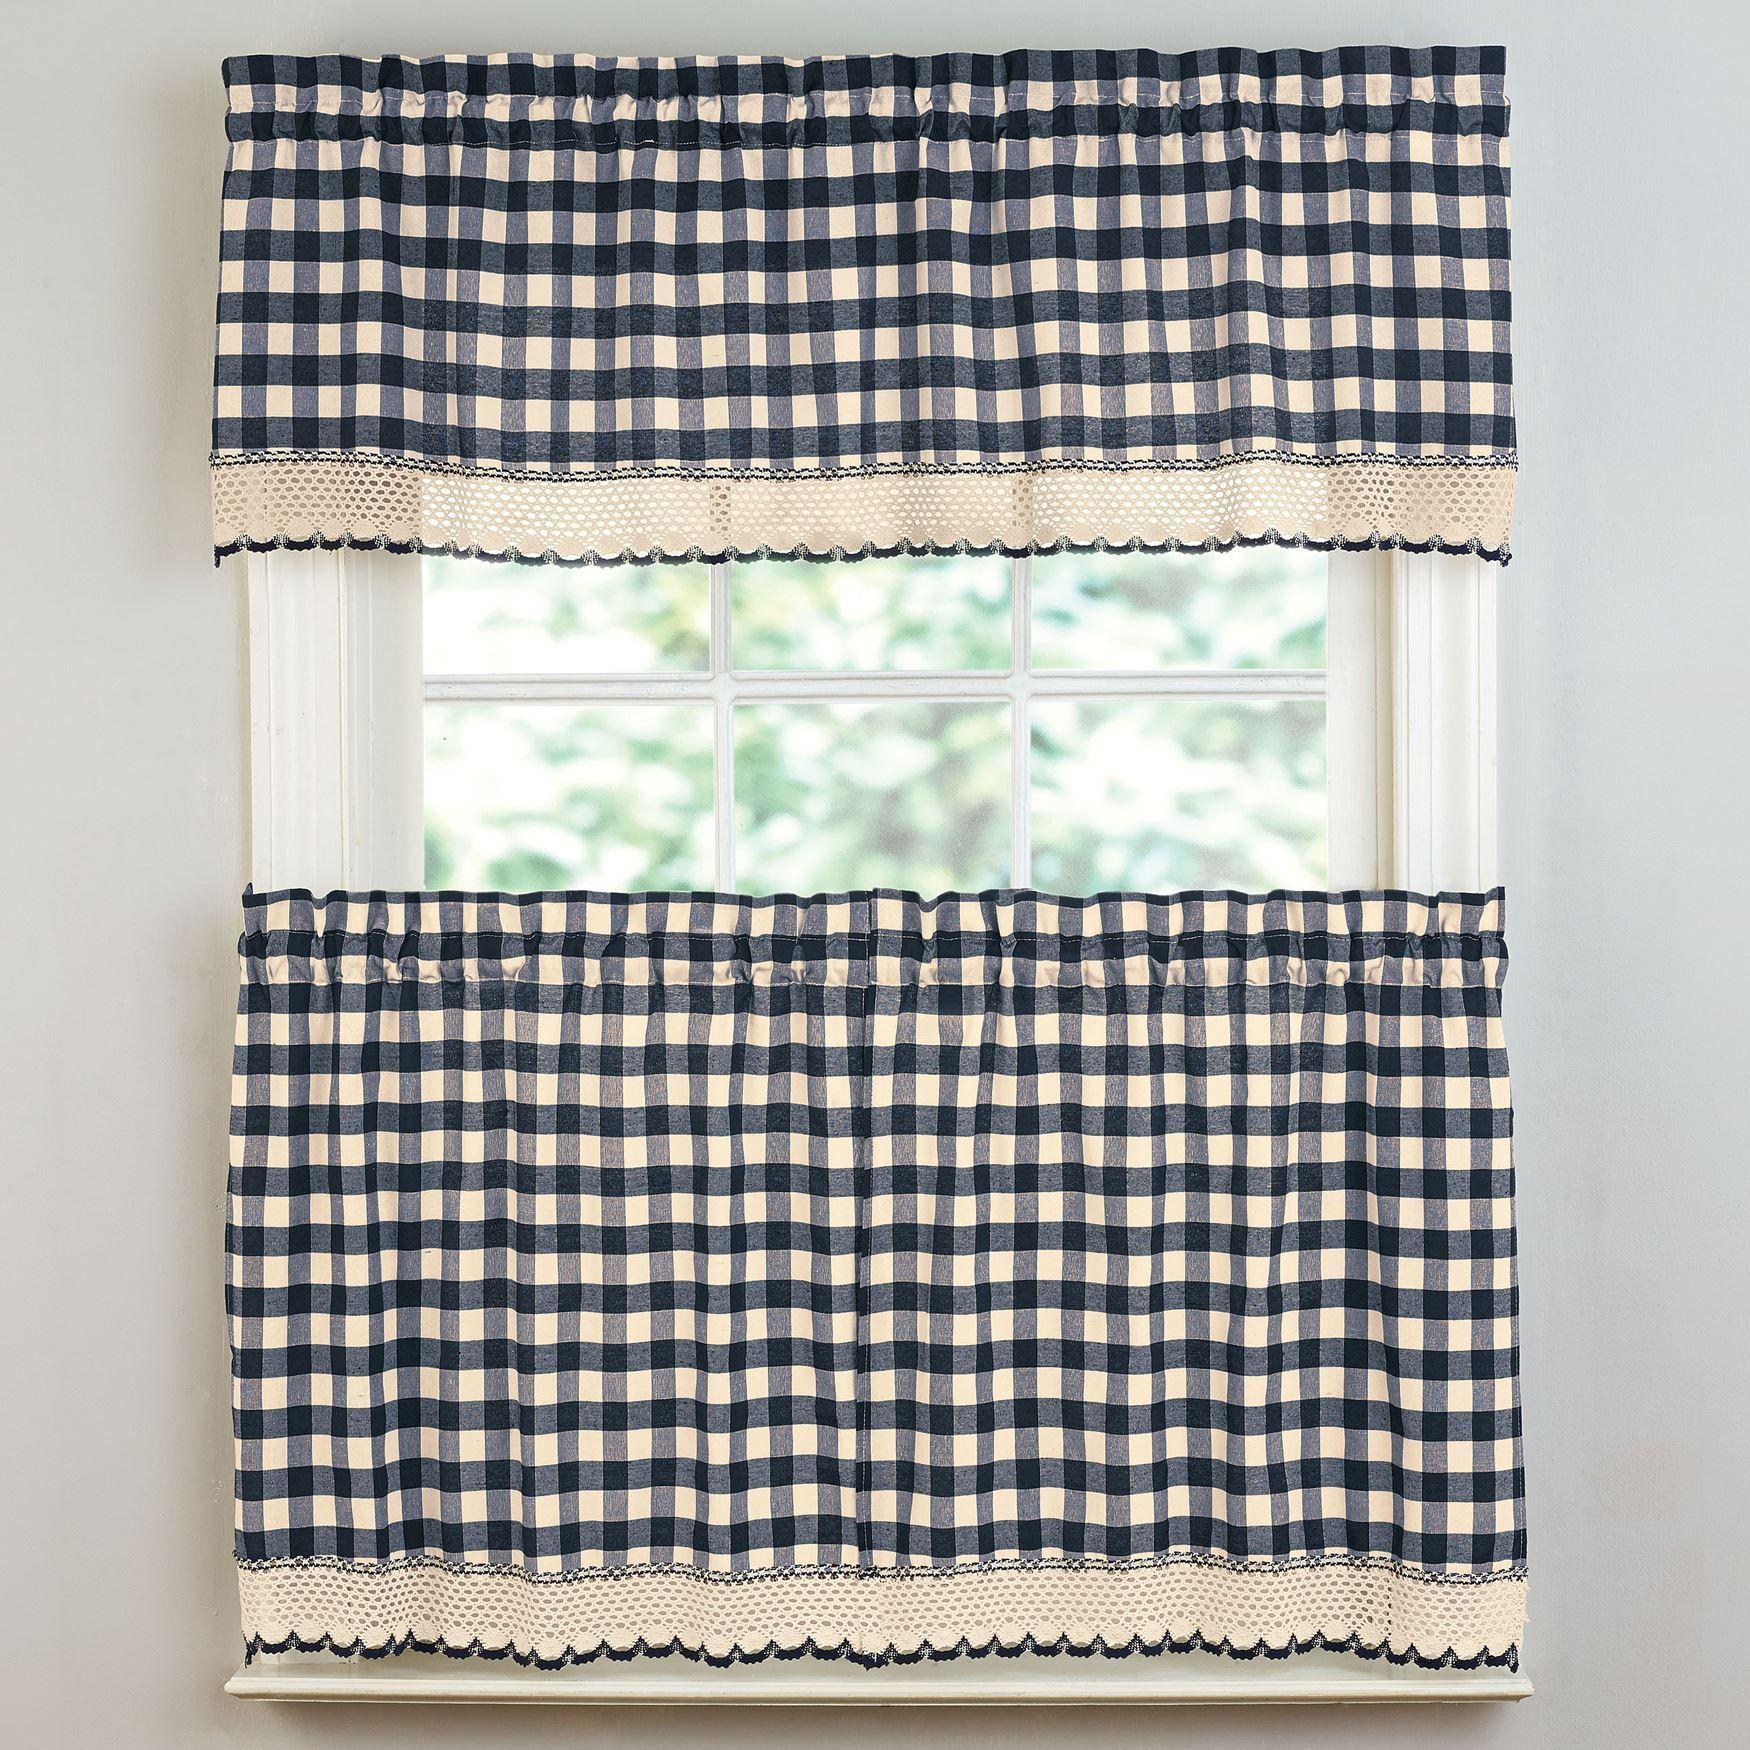 Buffalo Tier Curtain Window Brylanehome Doublecurtainsideas